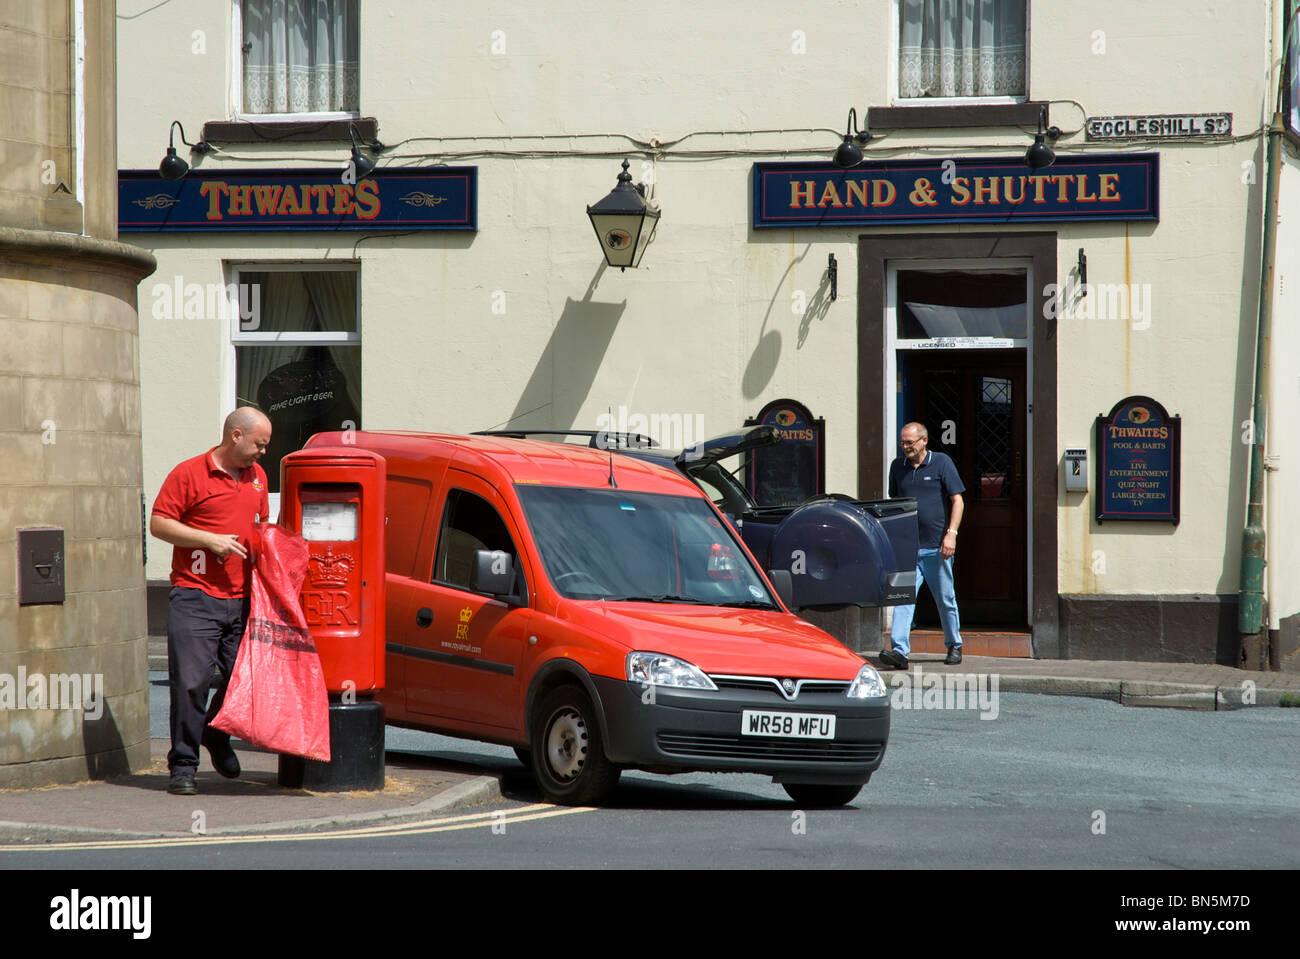 Postman emptying post-box in front of Hand & Shuttle pub, Padiham, Lancashire, England UK Stock Photo